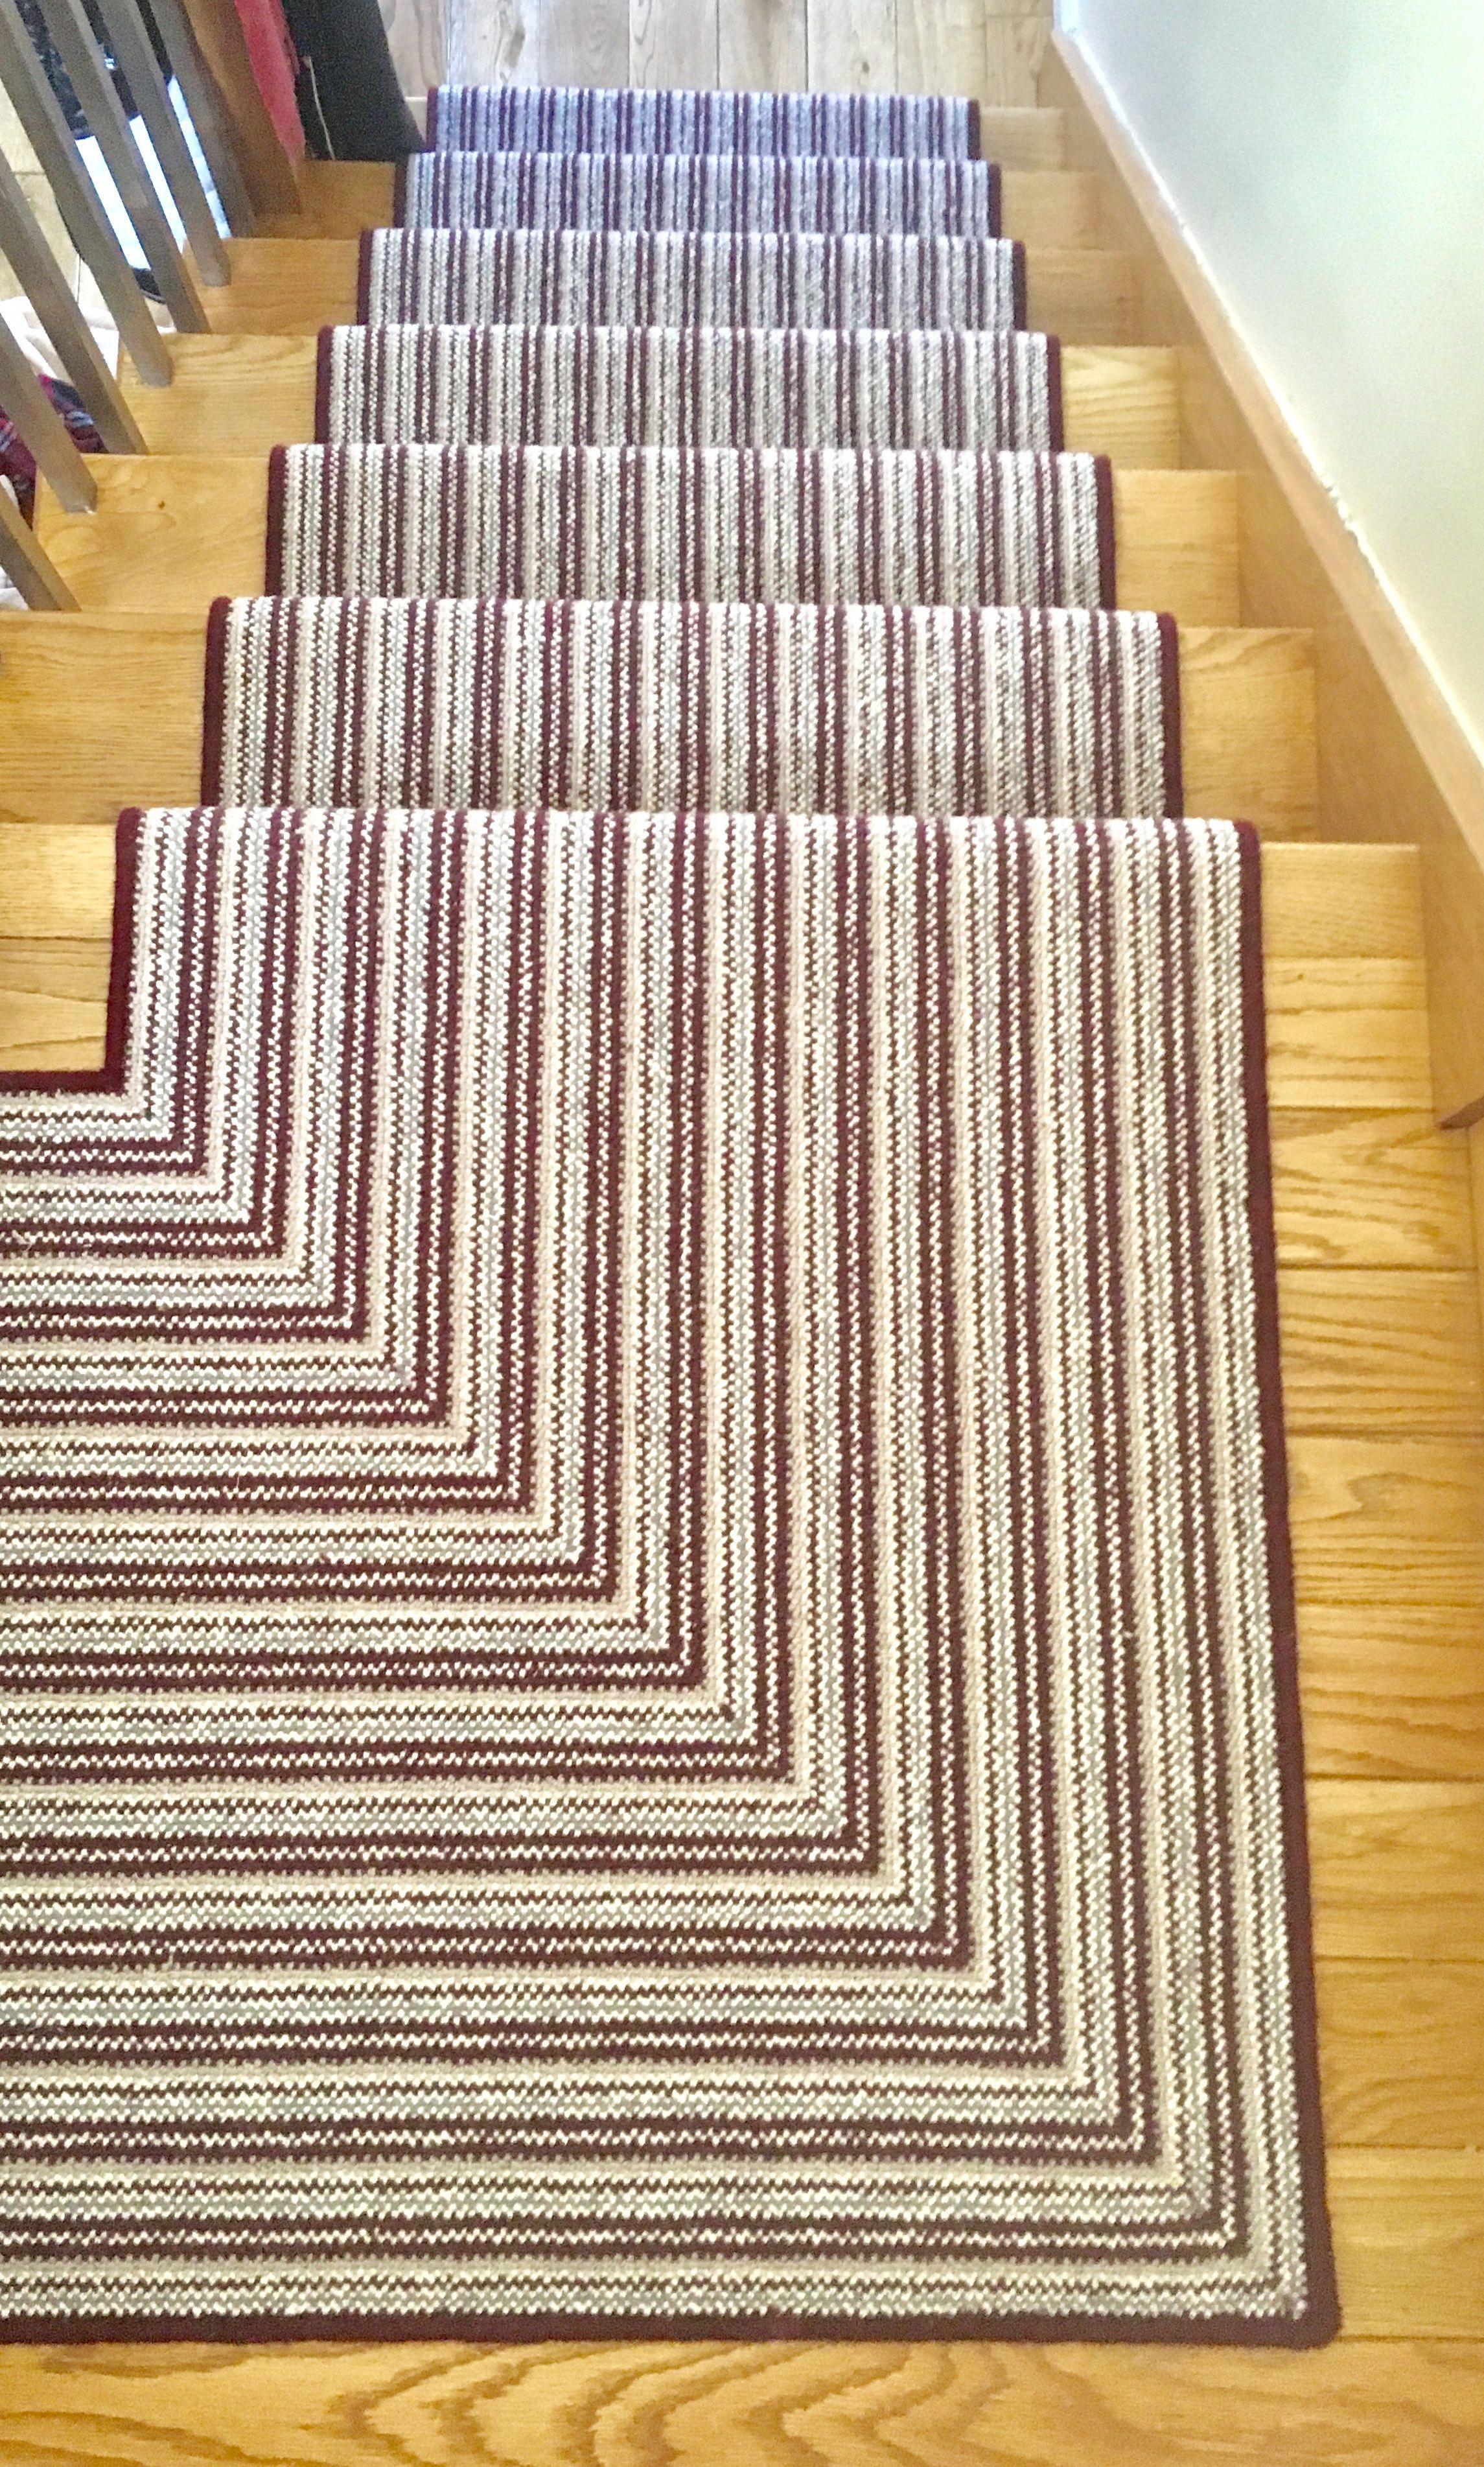 Carpet Runners Sold By The Foot Ebaycheapcarpetrunners | Home Depot Rug Runners By The Foot | Area Rugs | Regent Tan | Plastic | Carpet Protector | Mat